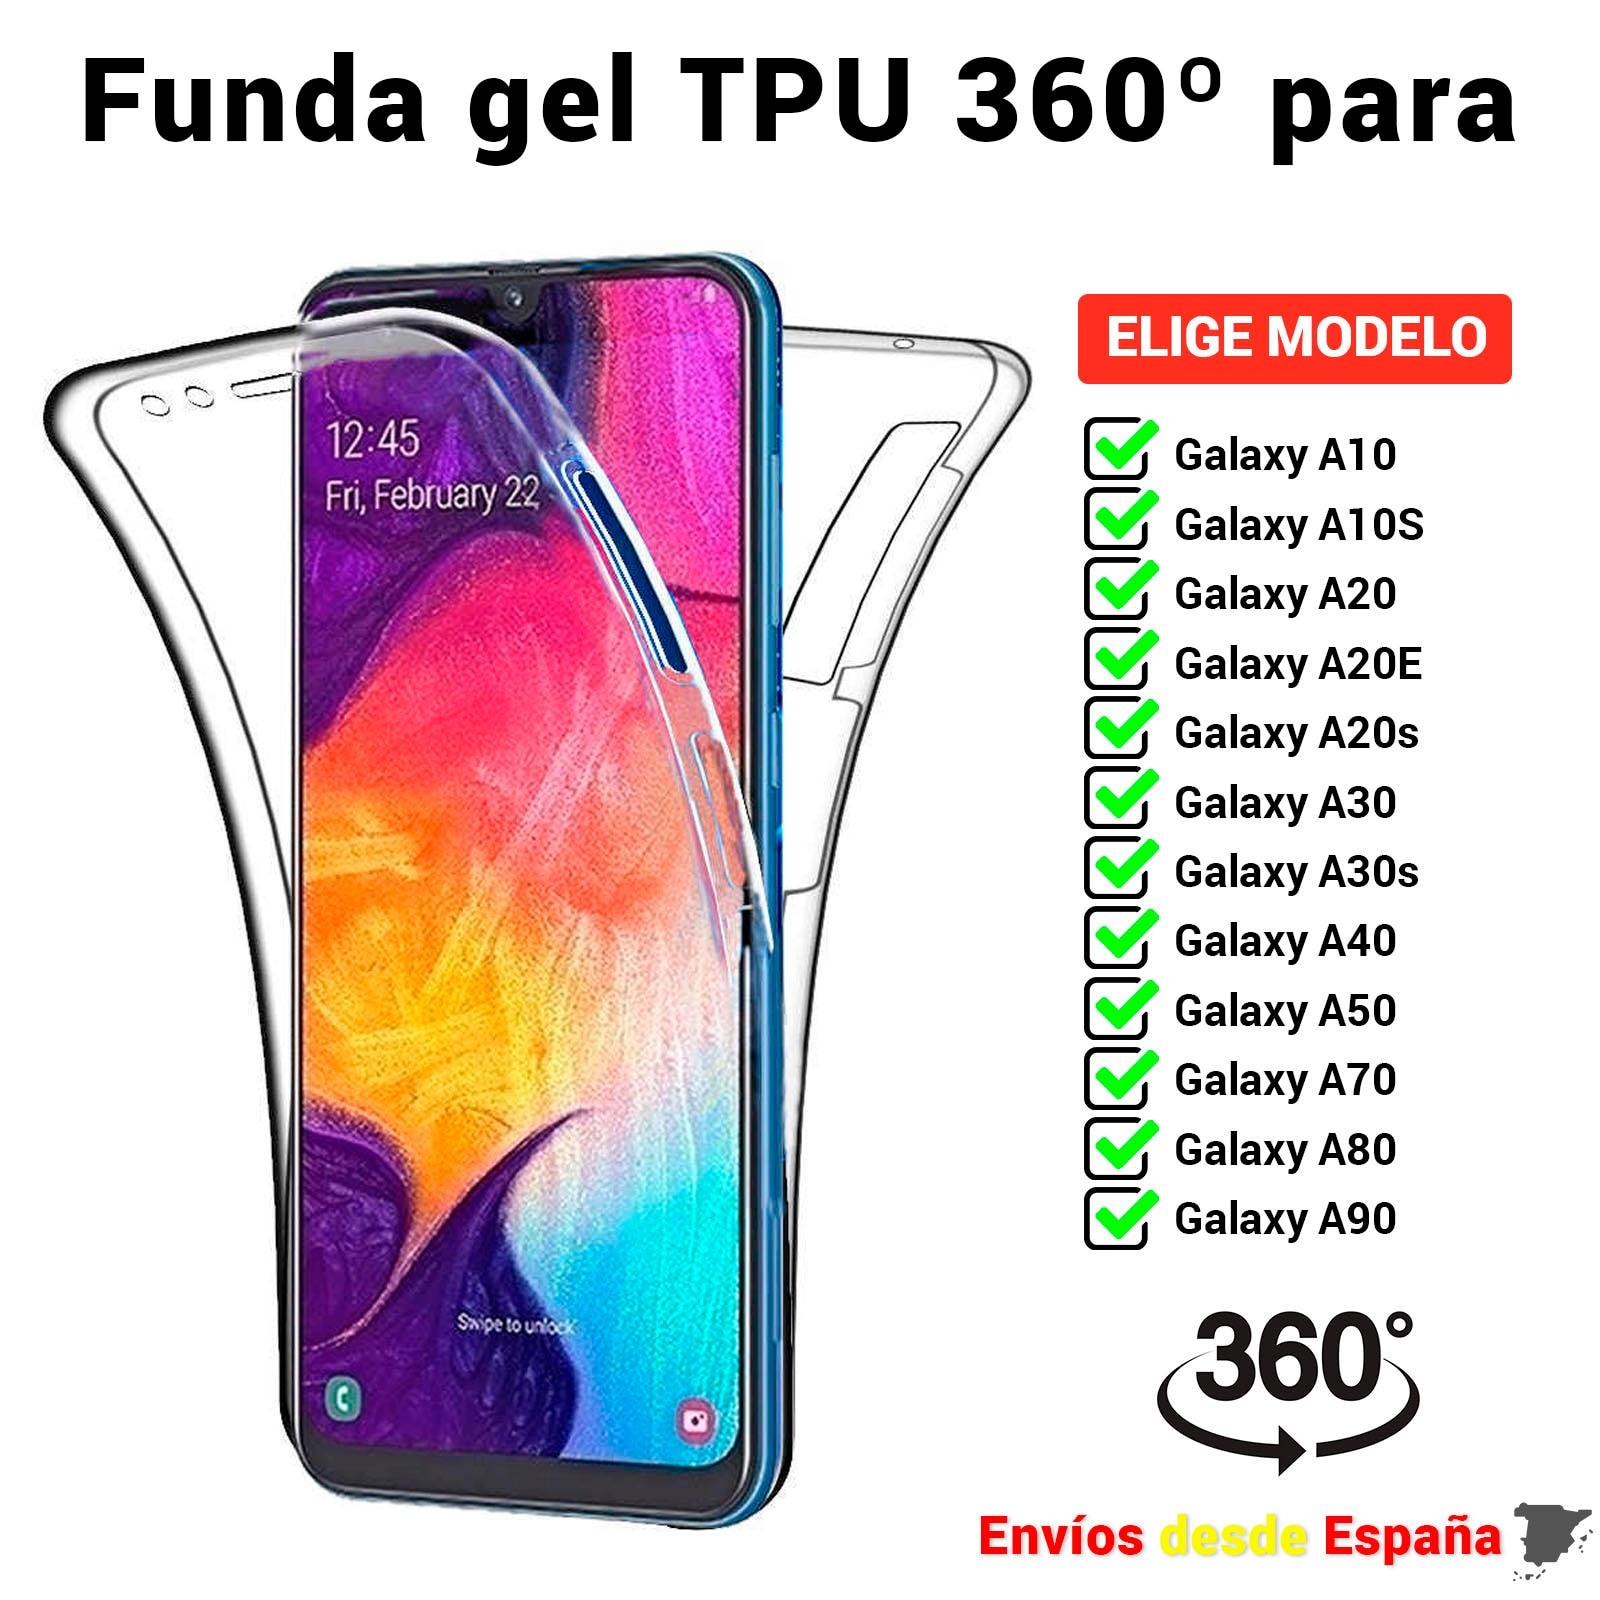 Чехол из ТПУ 360 для Samsung A10 A10S A20 A20E A20s A30 A30s A40 A50 A70 A80 A90. Полноразмерный двухсторонний прозрачный мобильный телефон